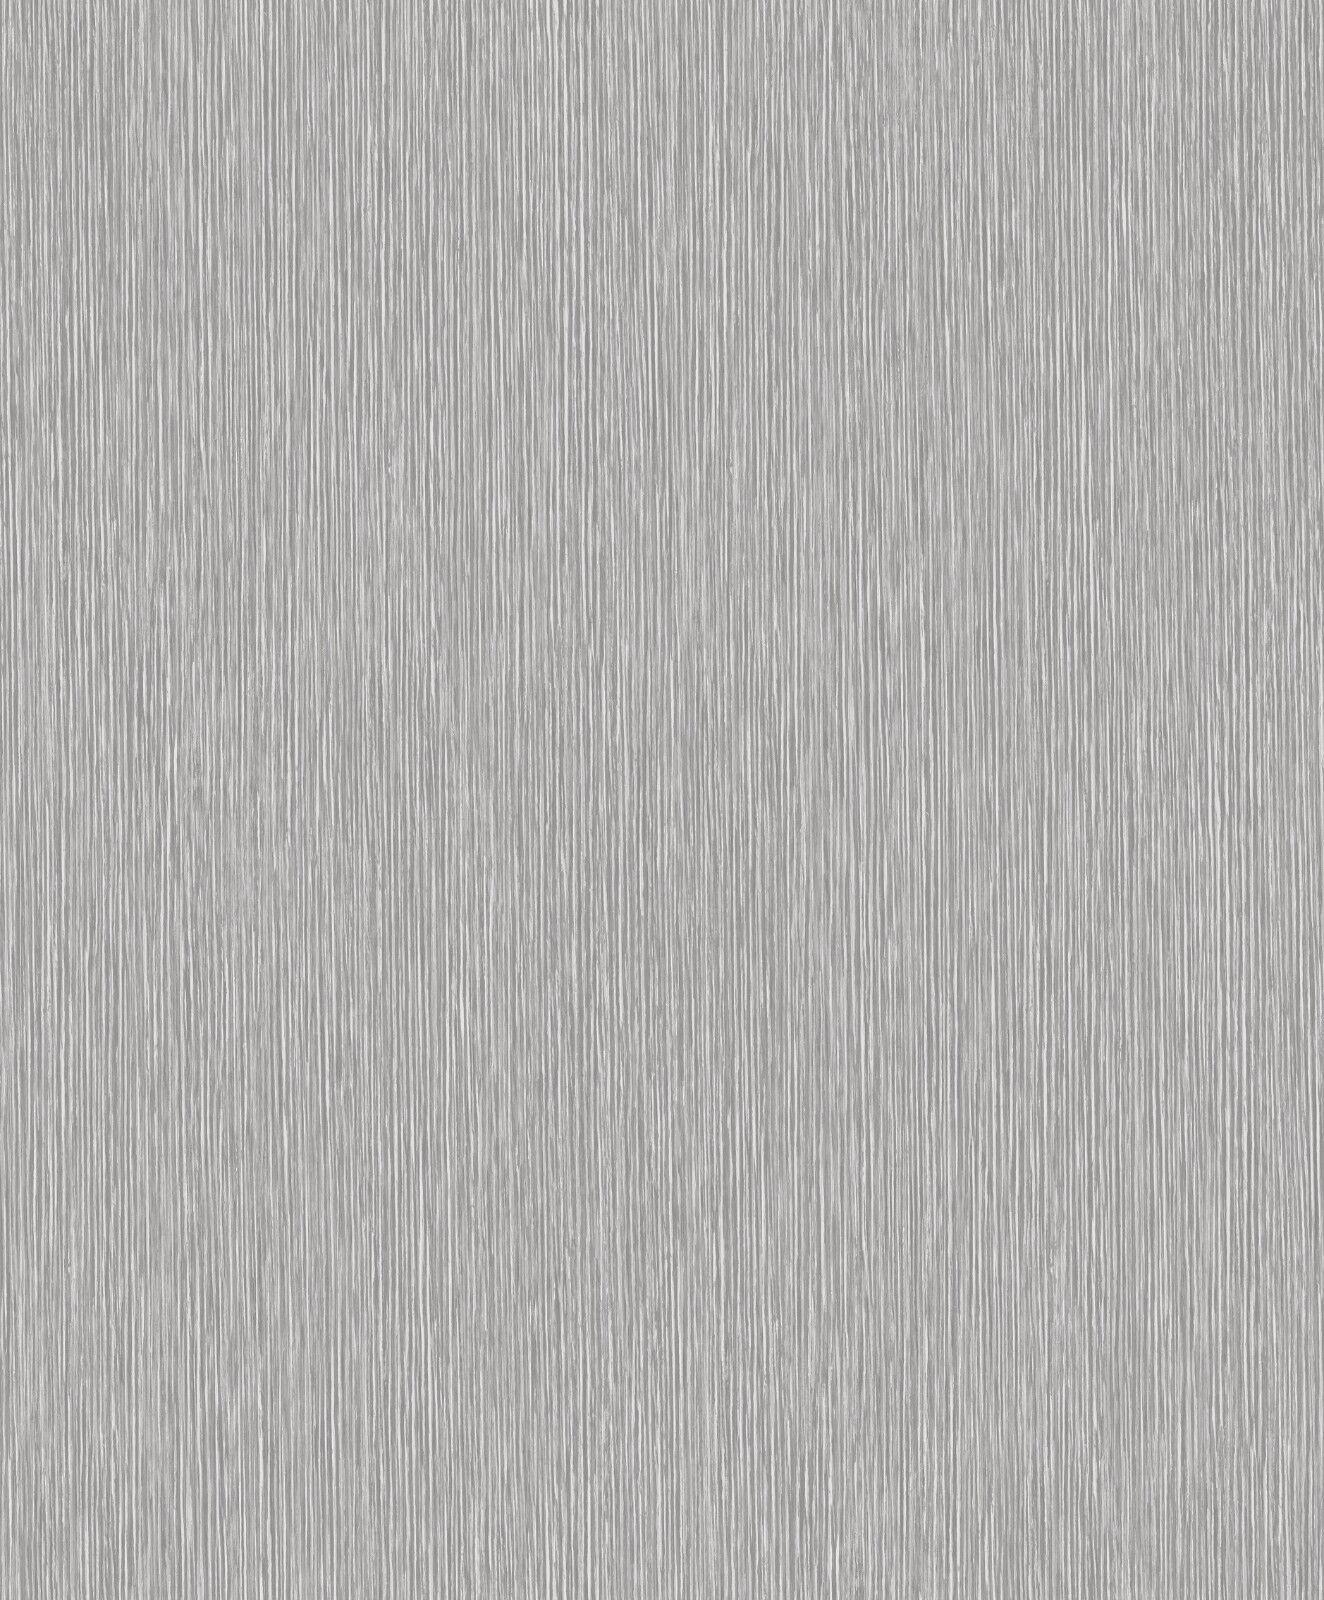 Vlies Tapete Uni Struktur grau silber 3611-30 Vertical Art   eBay